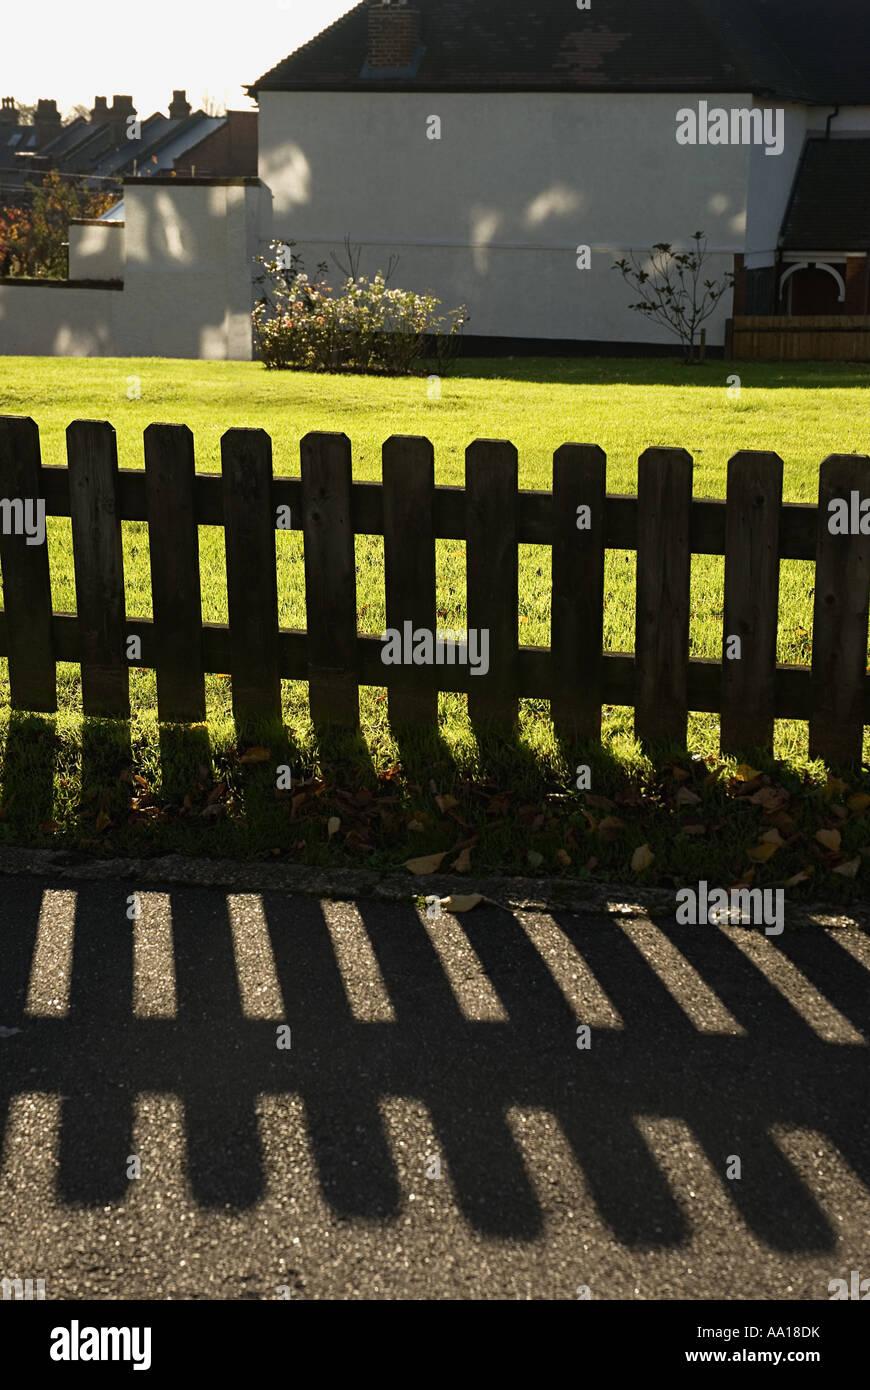 Garden fence - Stock Image